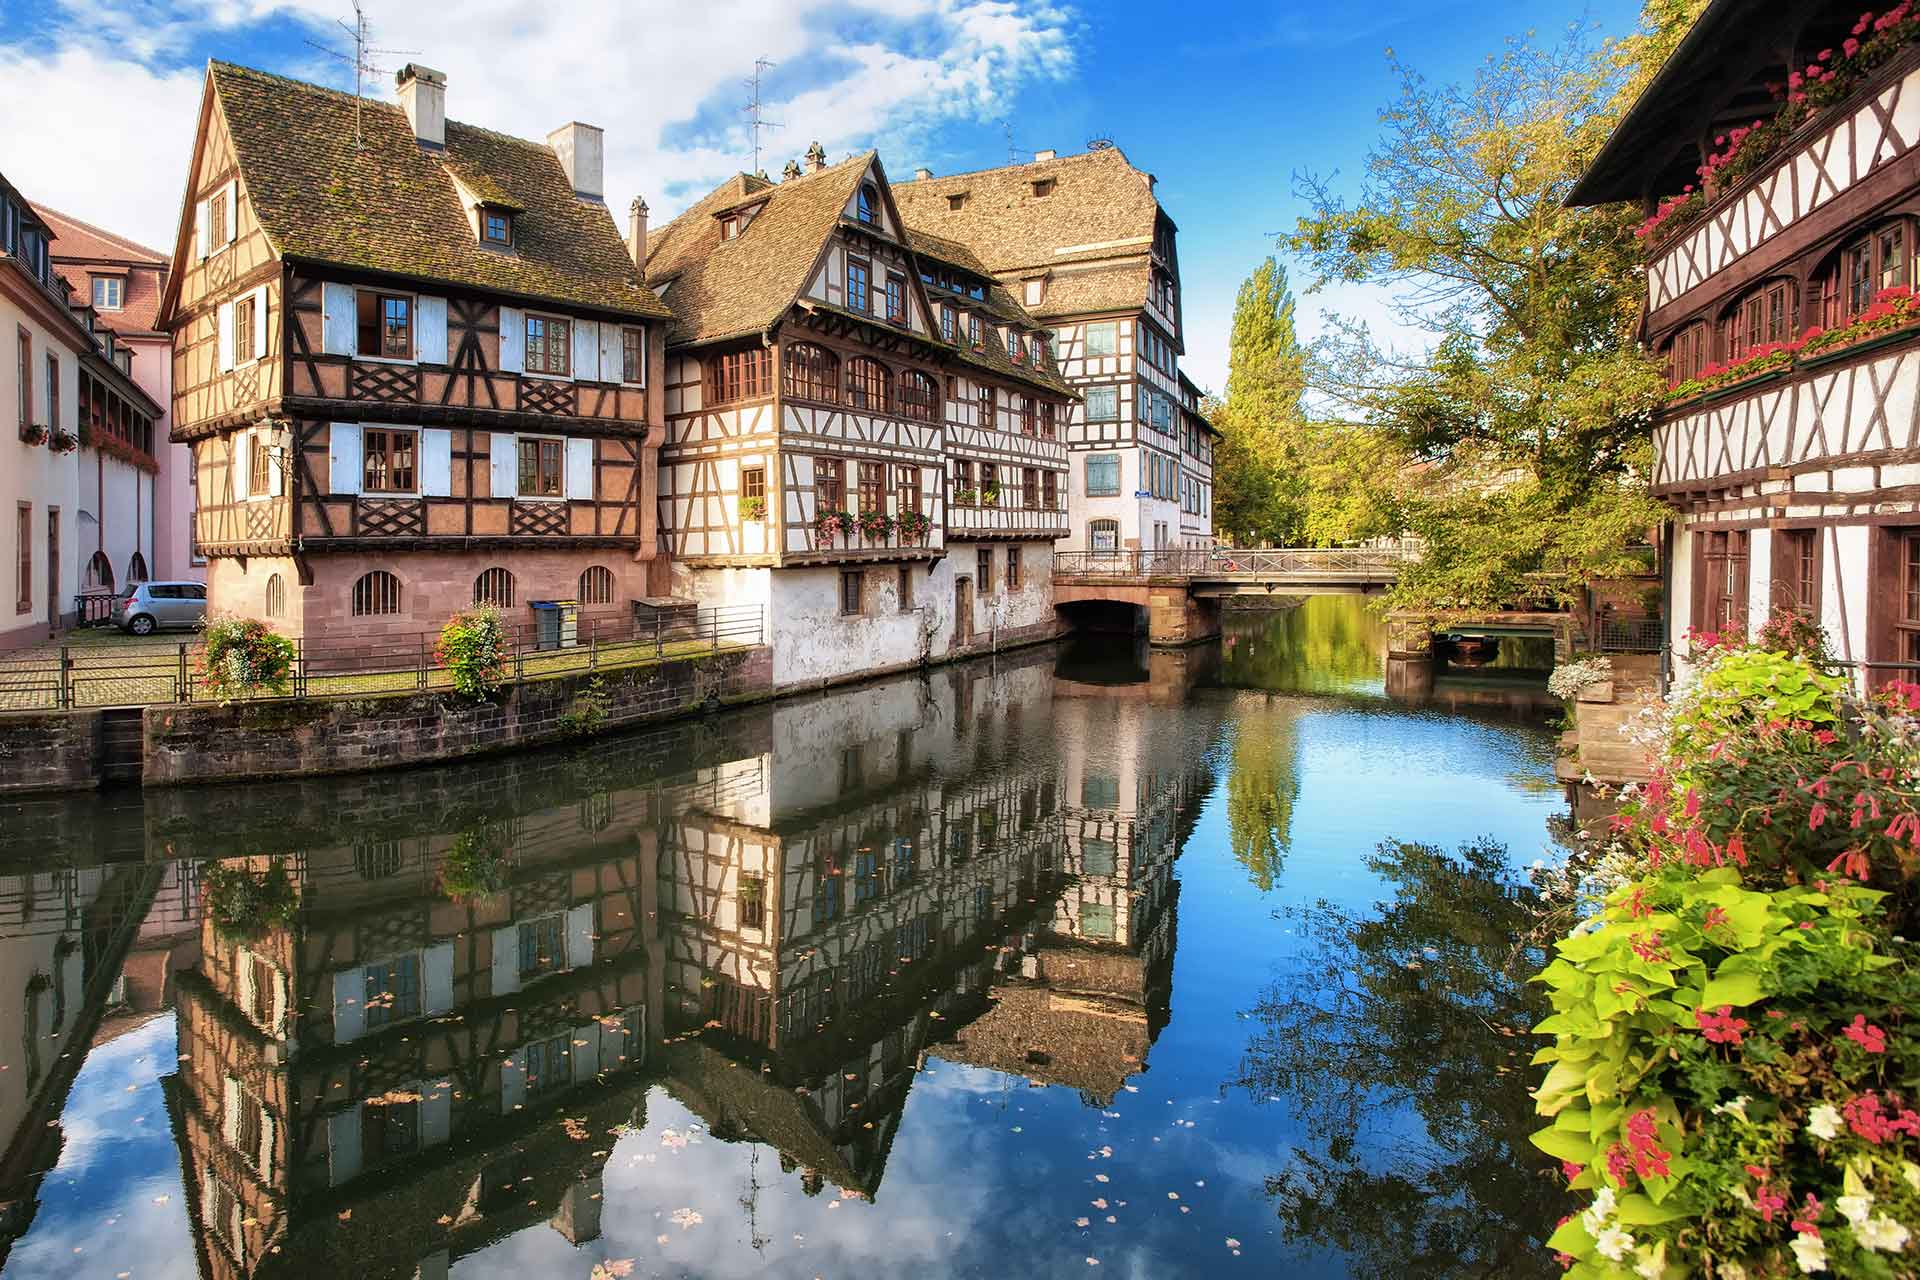 Ville de Strasbourg - Office de Tourisme de Strasbourg